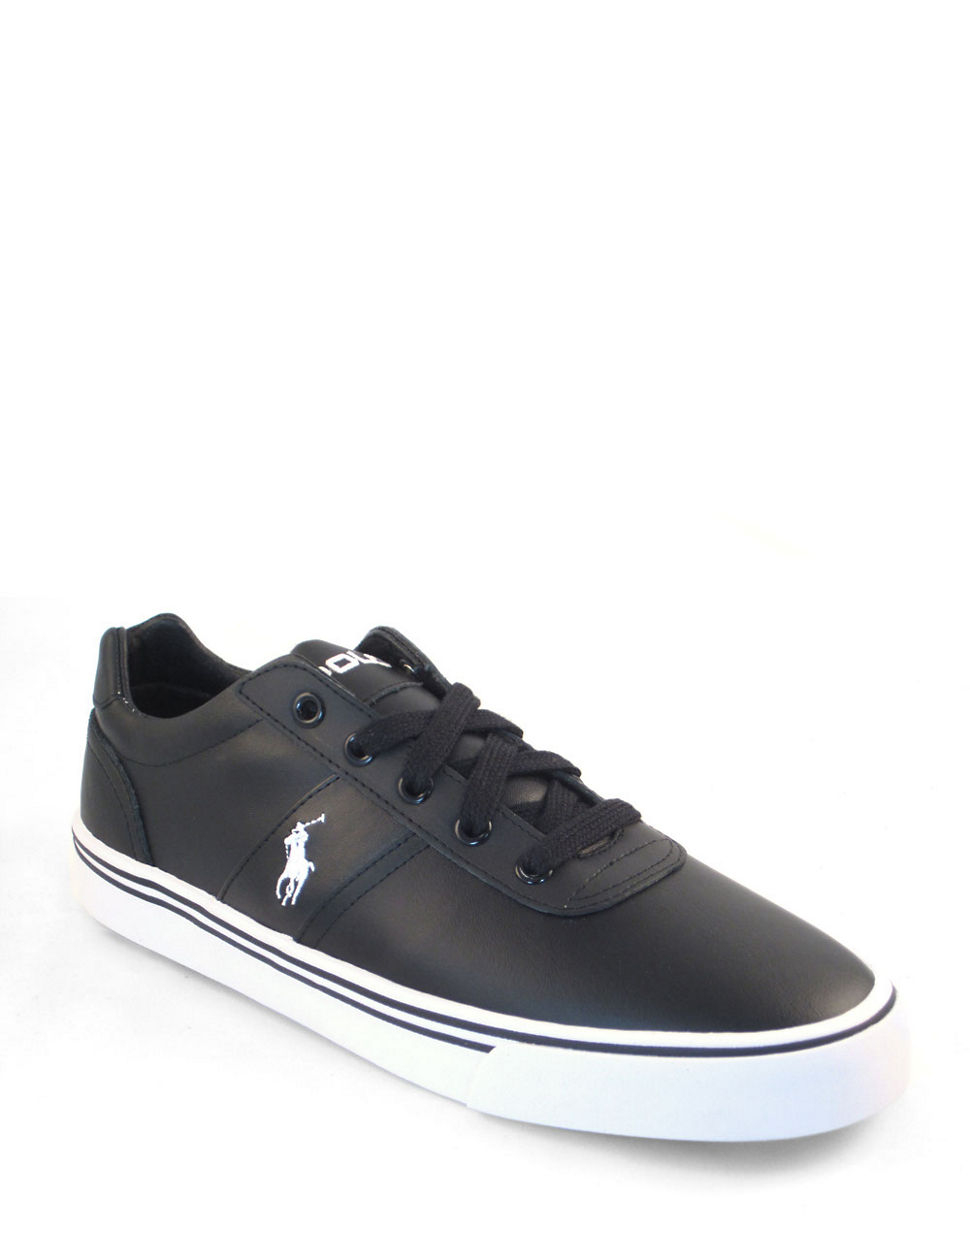 polo ralph lauren hanford black leather sneakers in black for men. Black Bedroom Furniture Sets. Home Design Ideas